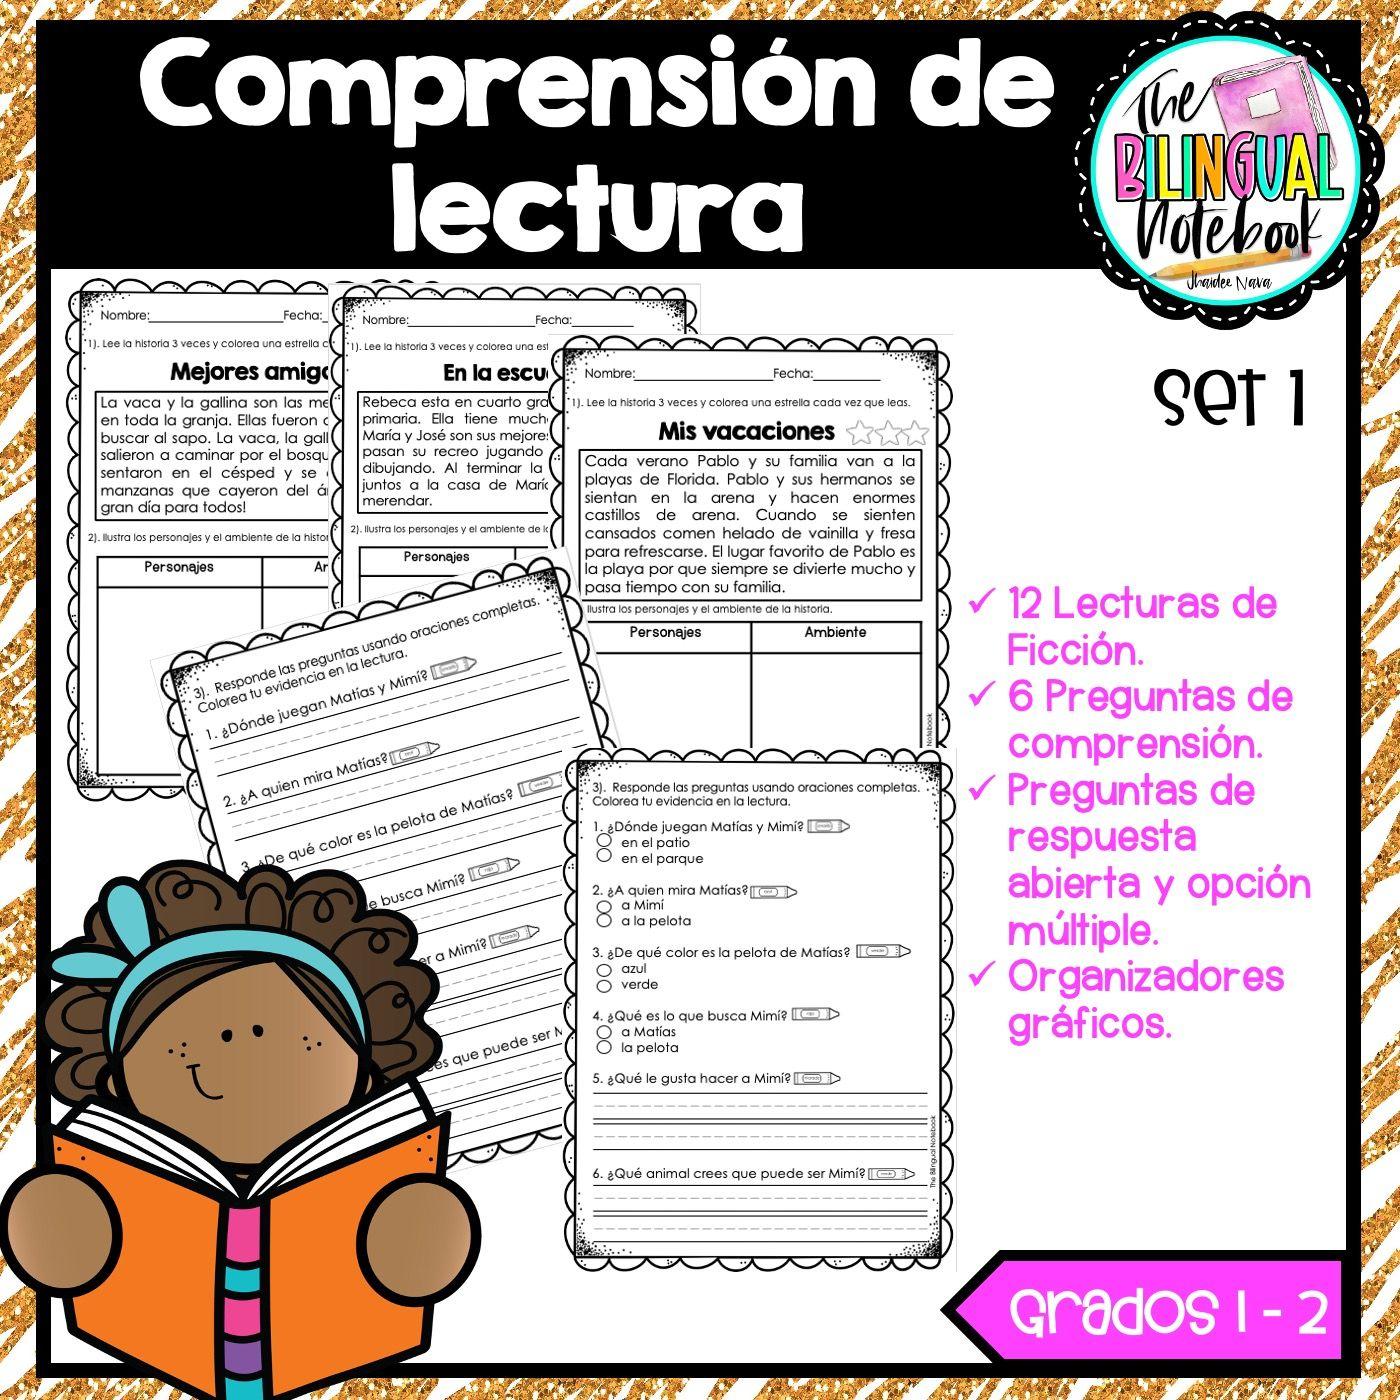 Comprension De Lectura Spanish Reading Comprehension Reading Comprehension Spanish Reading Reading Resources [ 1400 x 1400 Pixel ]